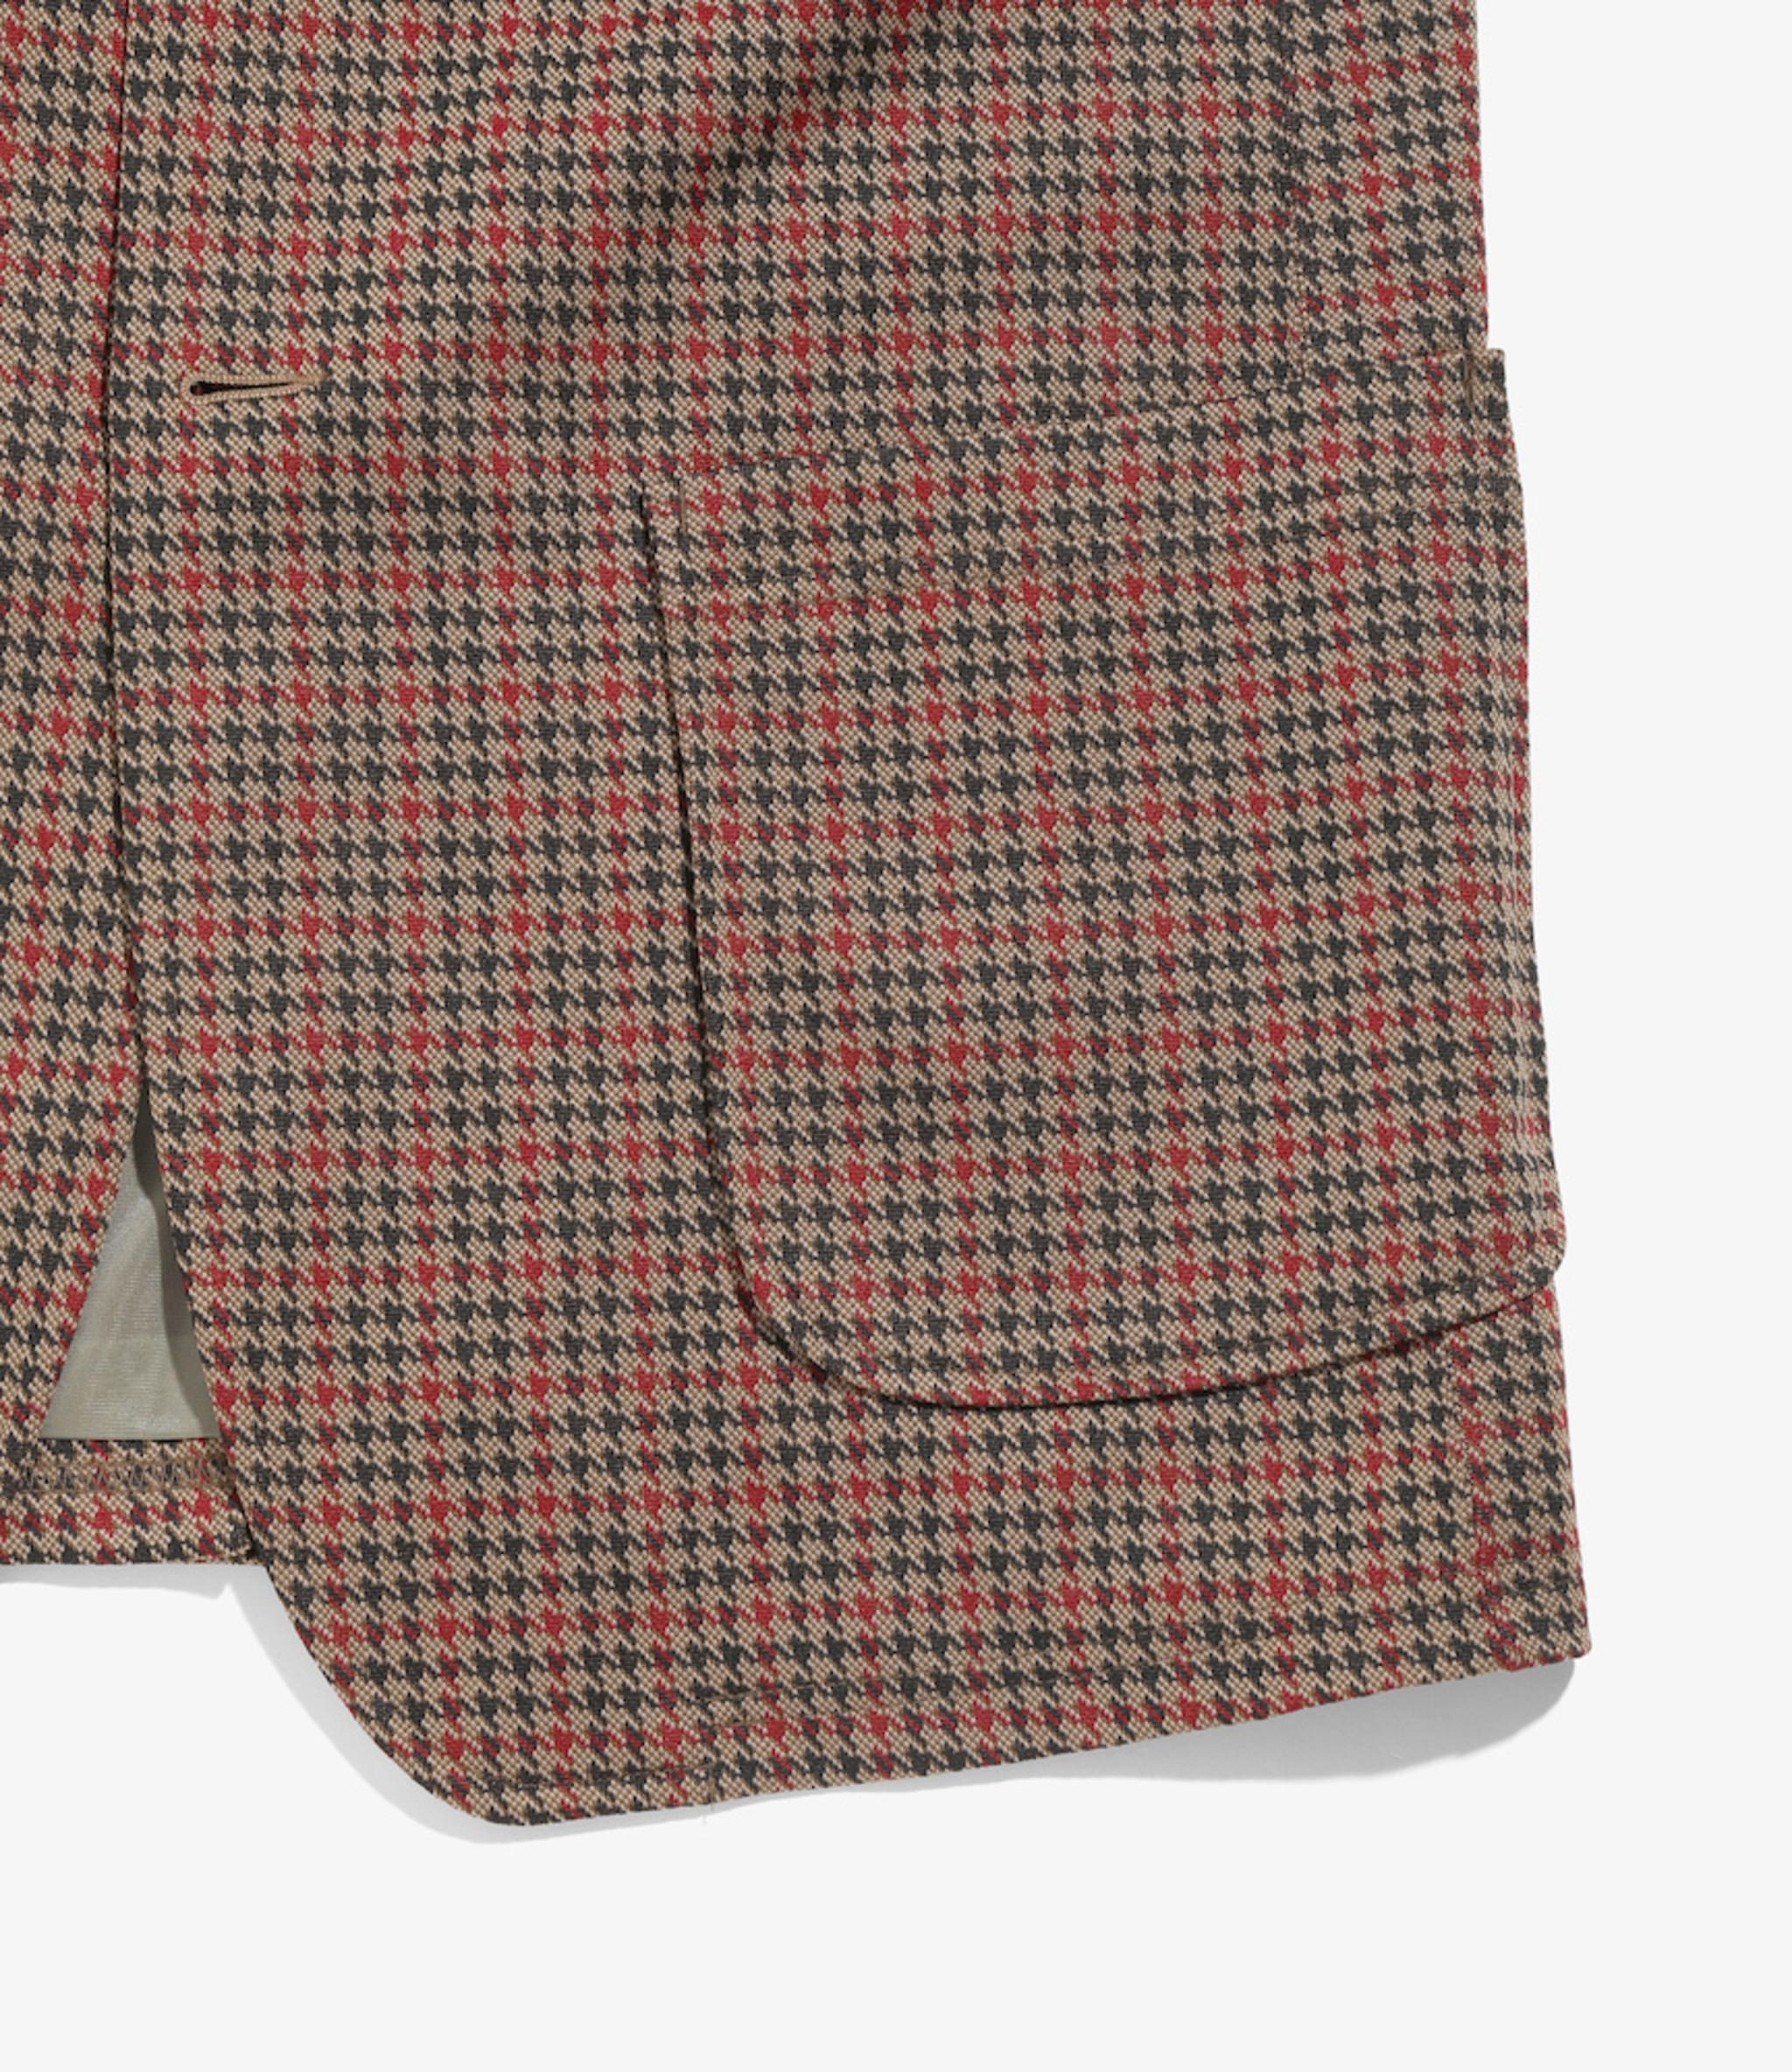 Needles 2B Jacket - Poly Jacquard - Houndstooth